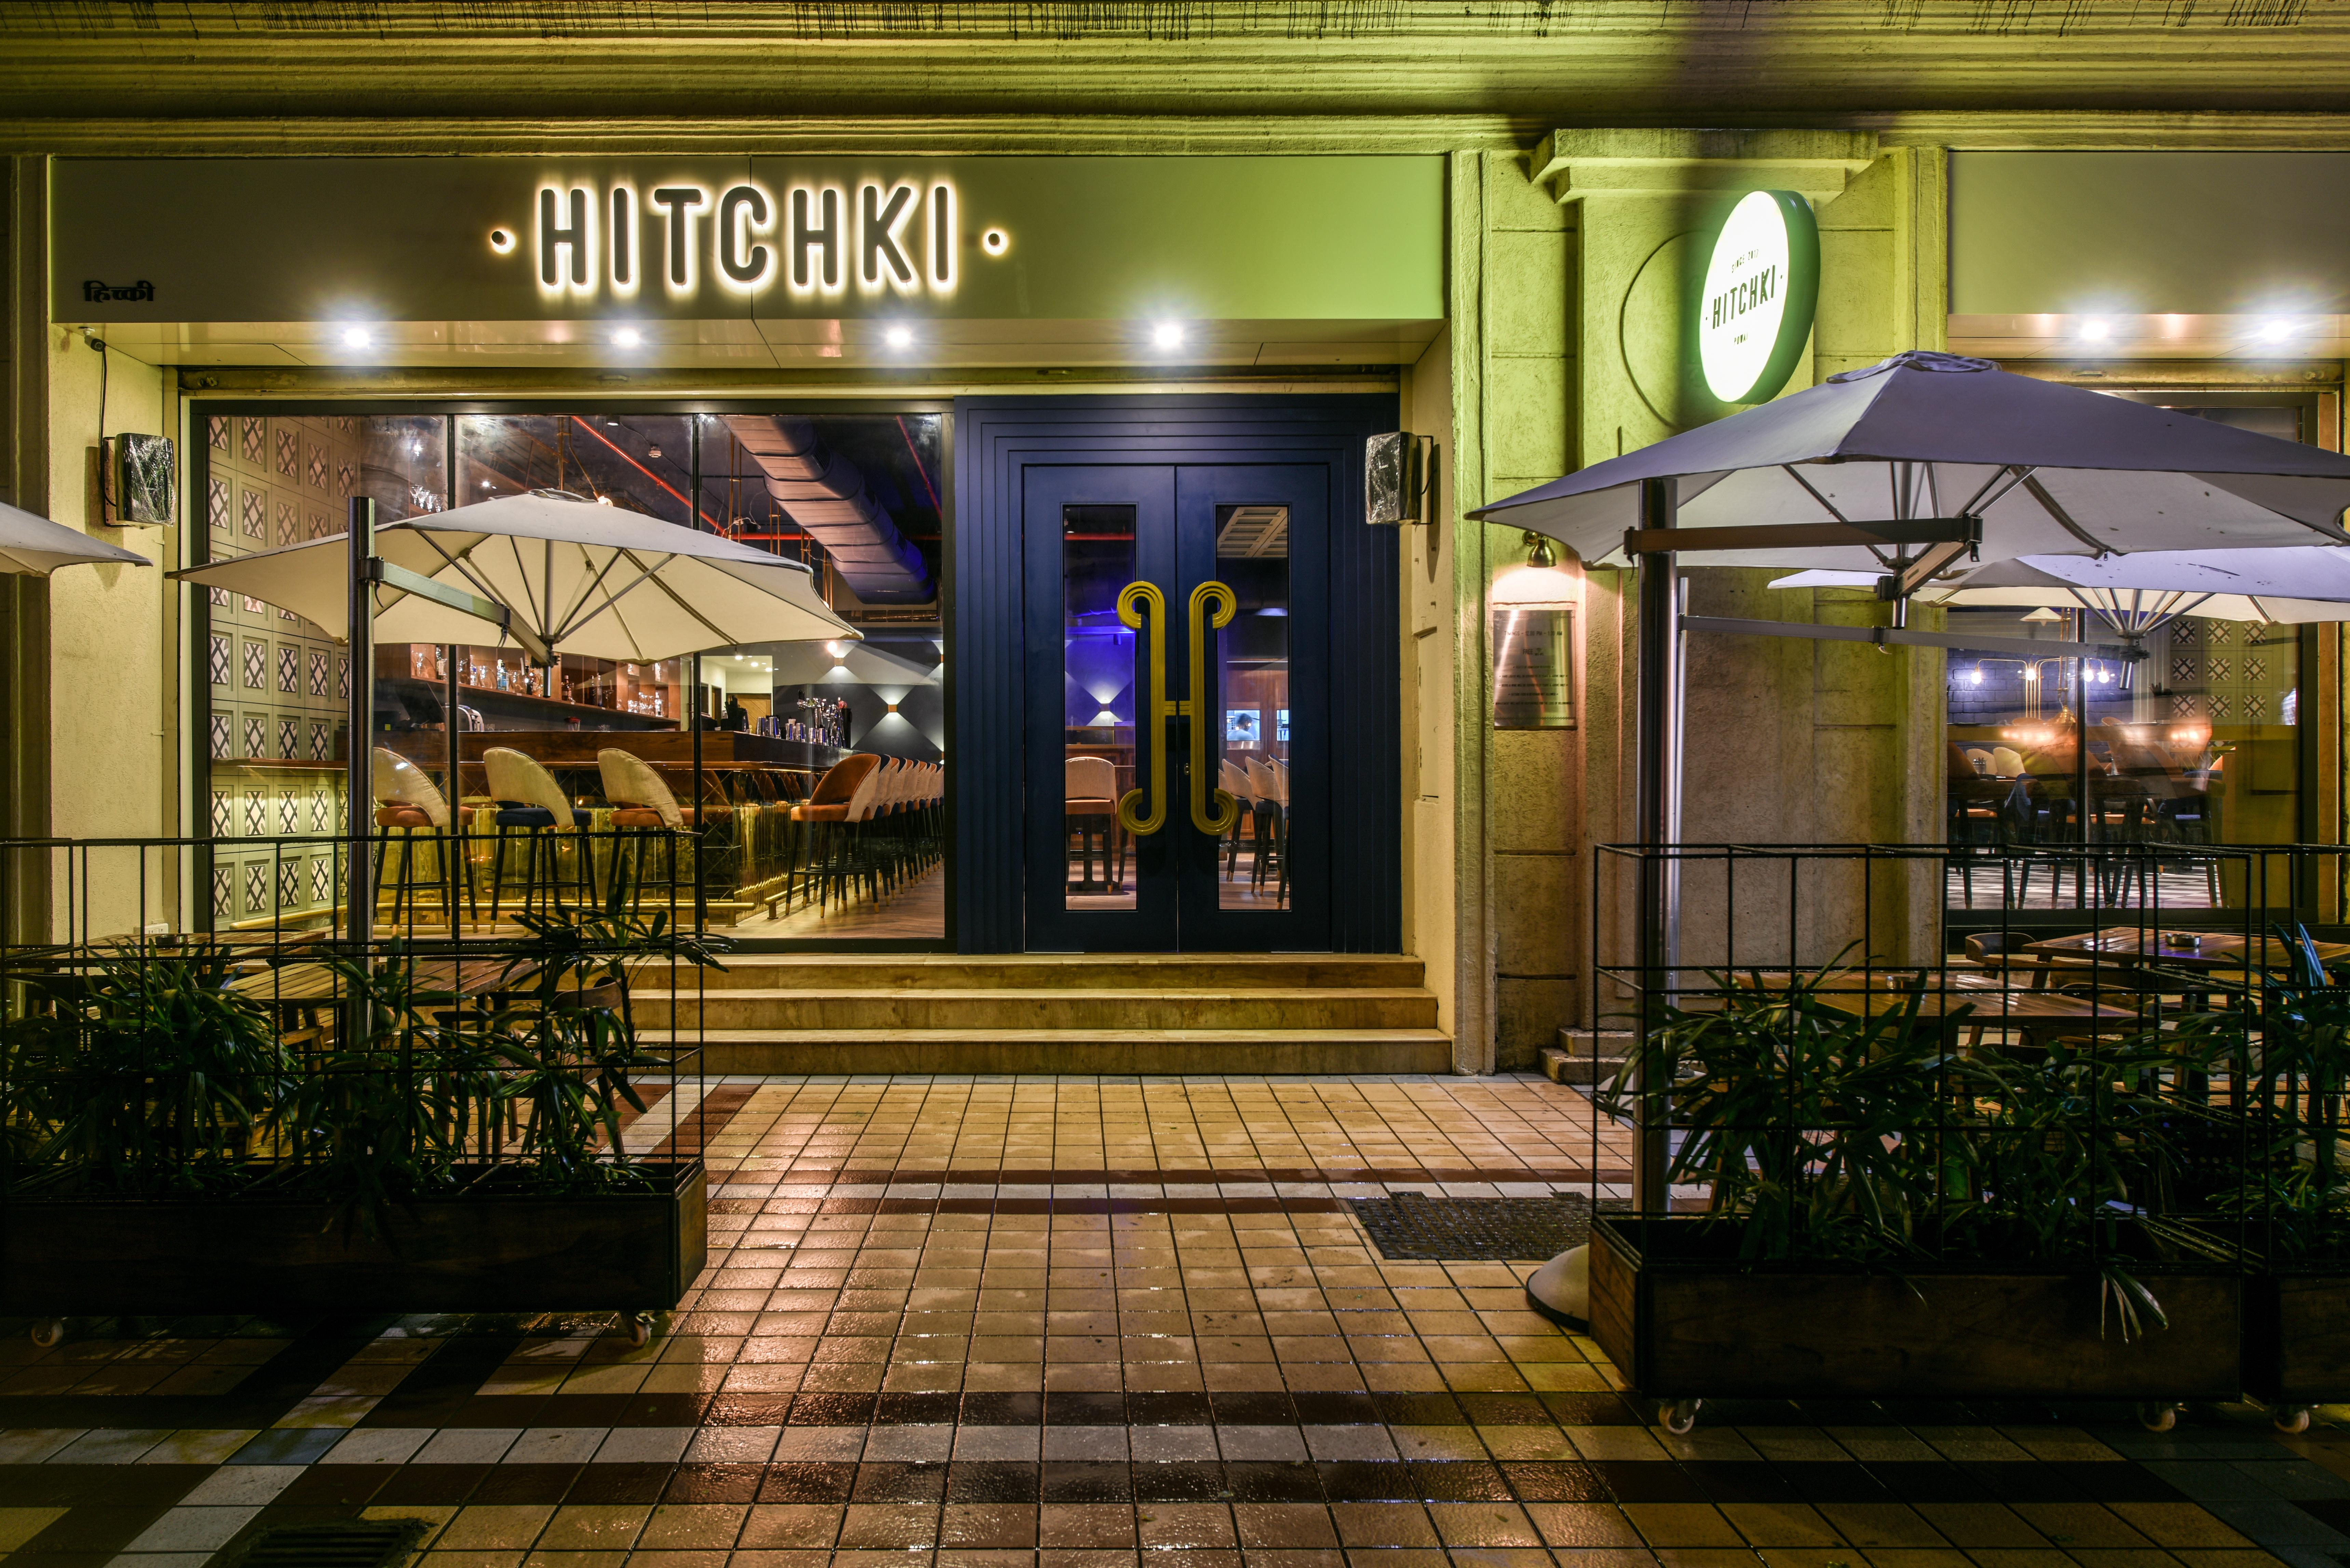 Restaurant Review: Hitchki at Bazxar DIFC